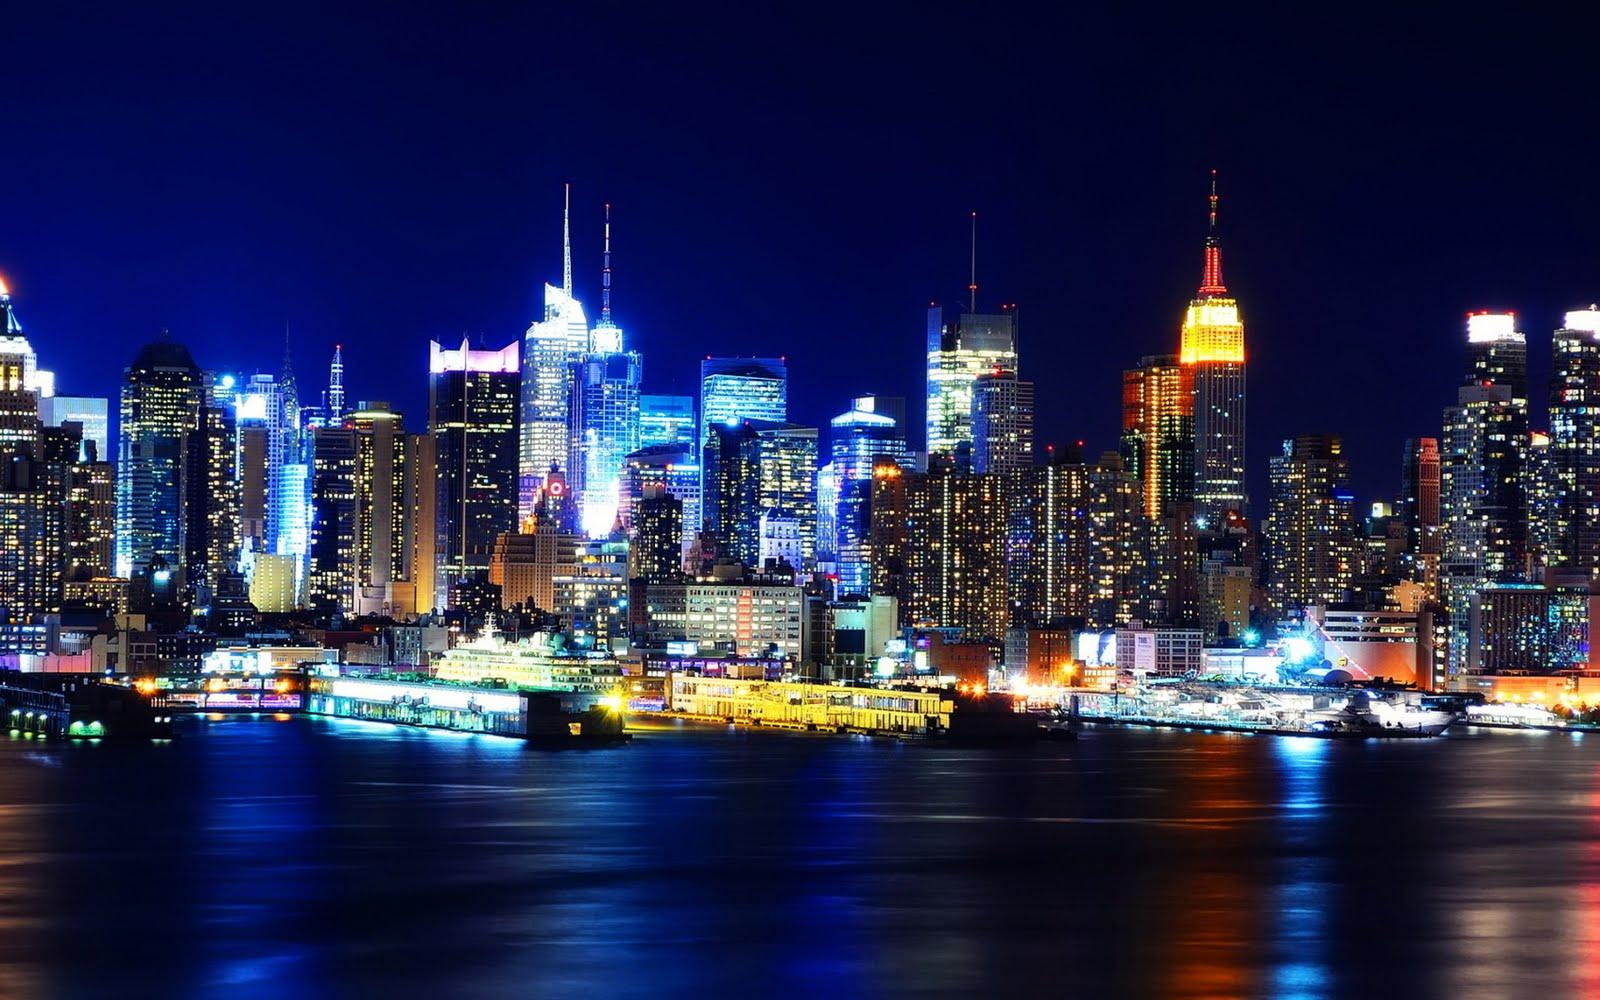 http://4.bp.blogspot.com/-Rlb9Jt7bYmw/TcFNv_I9DxI/AAAAAAAADbs/l9FnQP7iqr0/s1600/new_york_manhatan.jpg